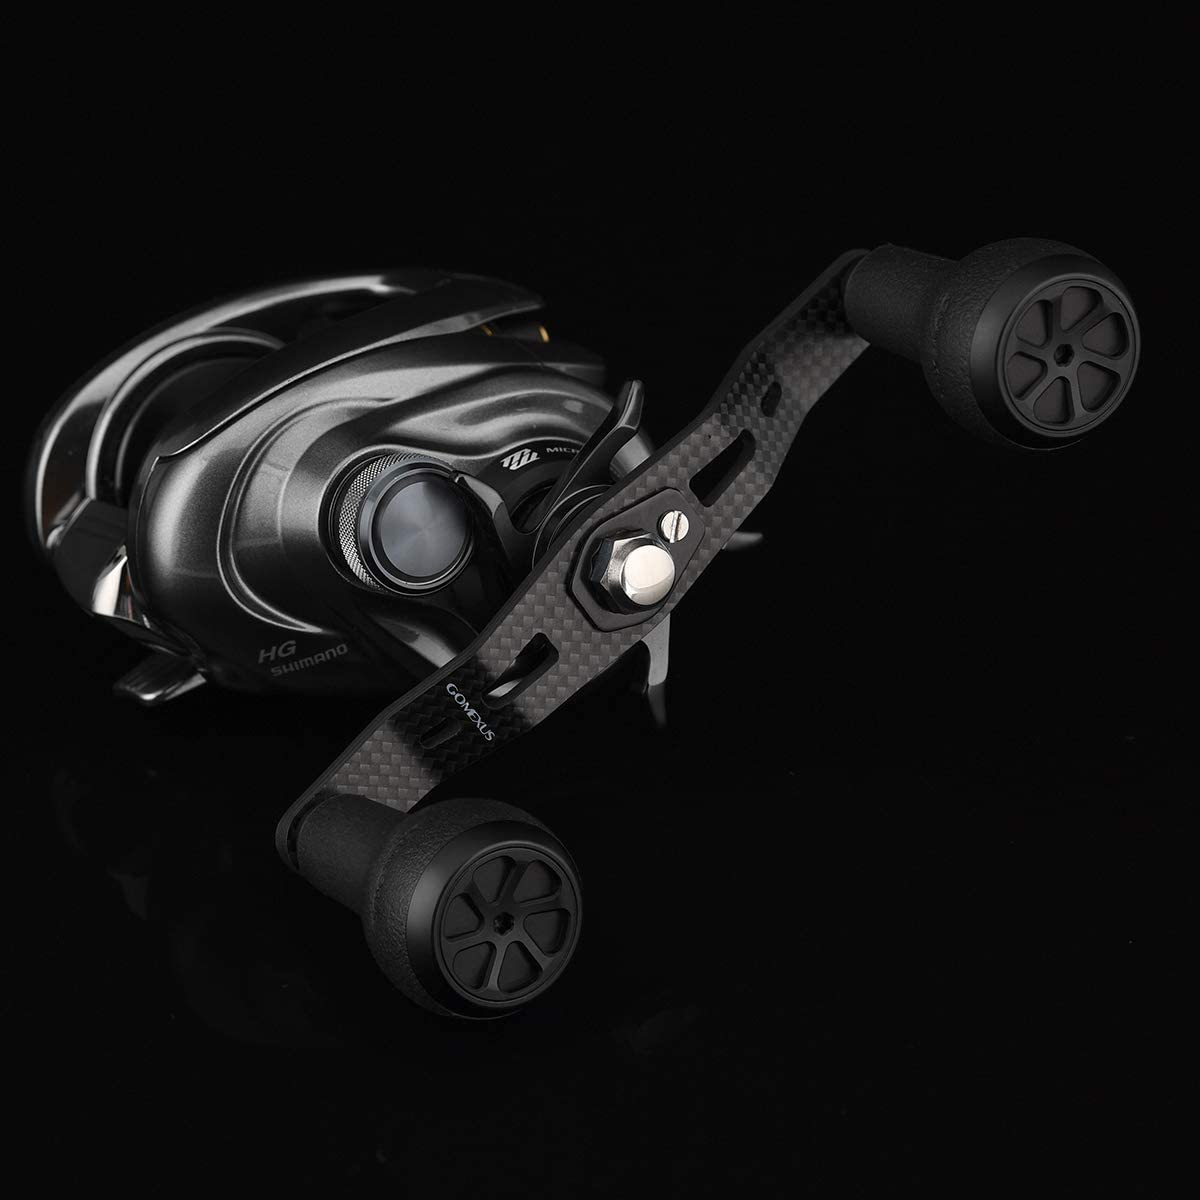 GOMEXUS Carbon Power Griff 8 x 5 mm kompatibel f/ür Shimano Tranx 300 400 Daiwa Tatula Coastal Lexa Abu Garcia Revo Series Lews Baitcaster Reel Ersatzteil Angelrolle Griff 105 mm